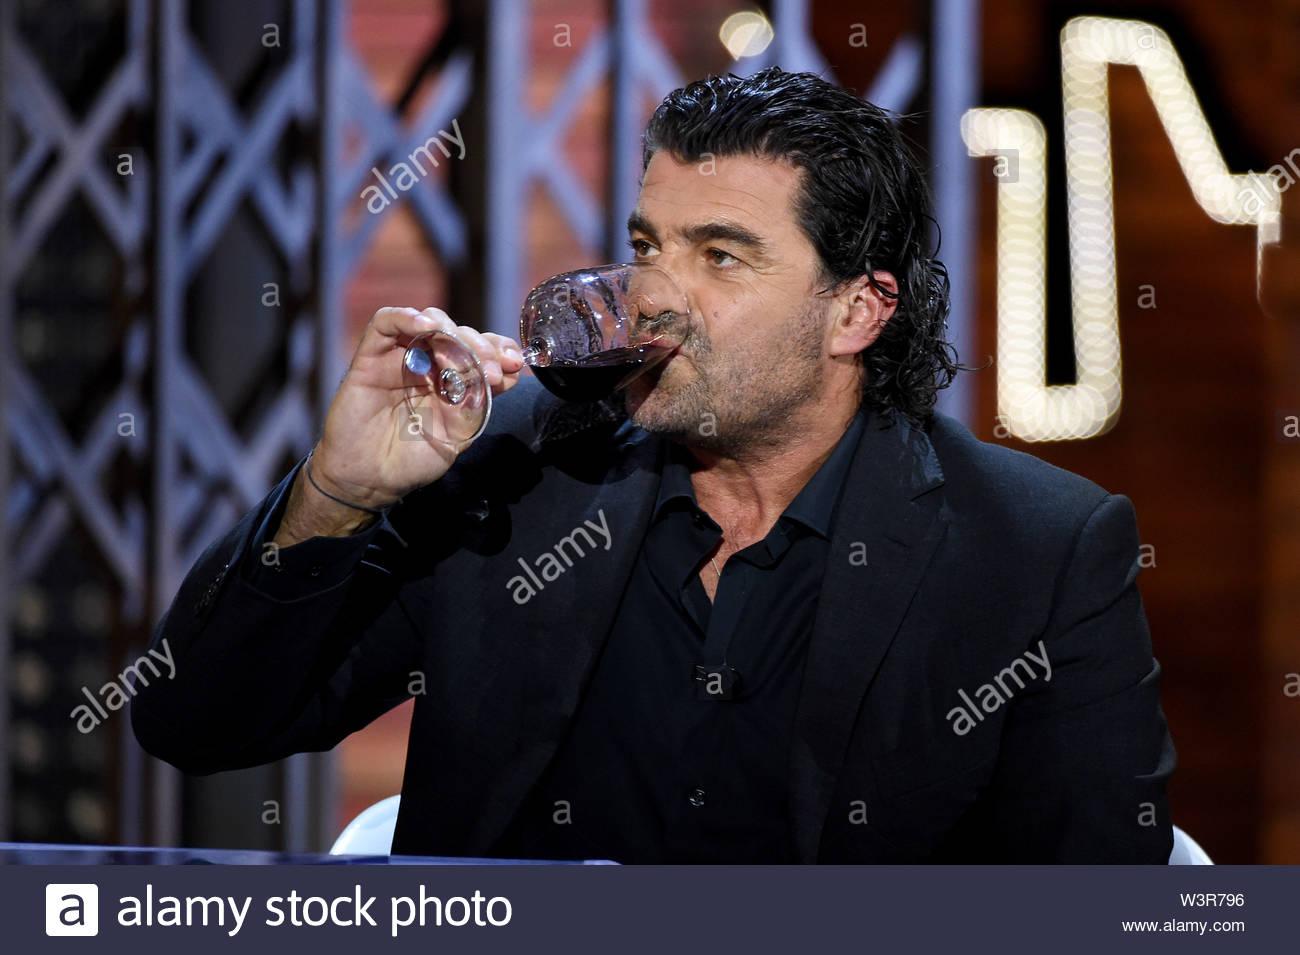 Alberto Tomba Milano 13 07 2019 Stock Photo 260510130 Alamy